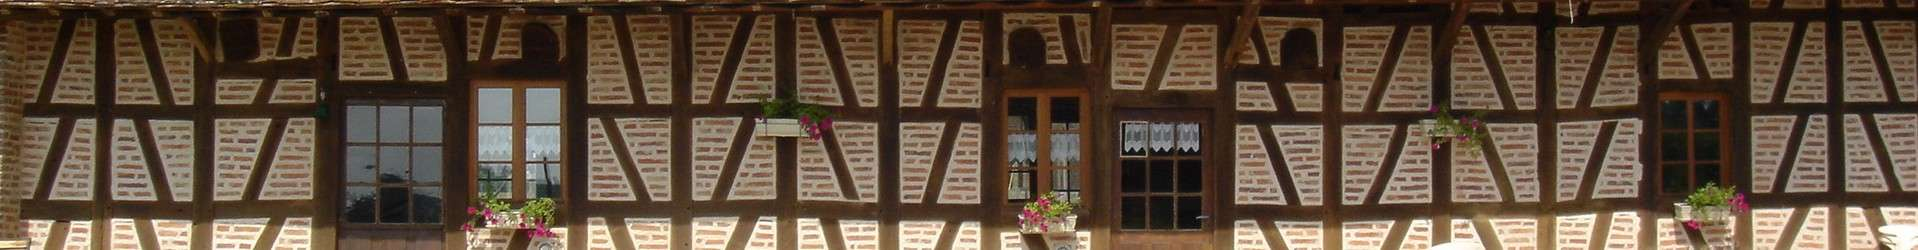 banniere-la-bonardiere-otpbb-46